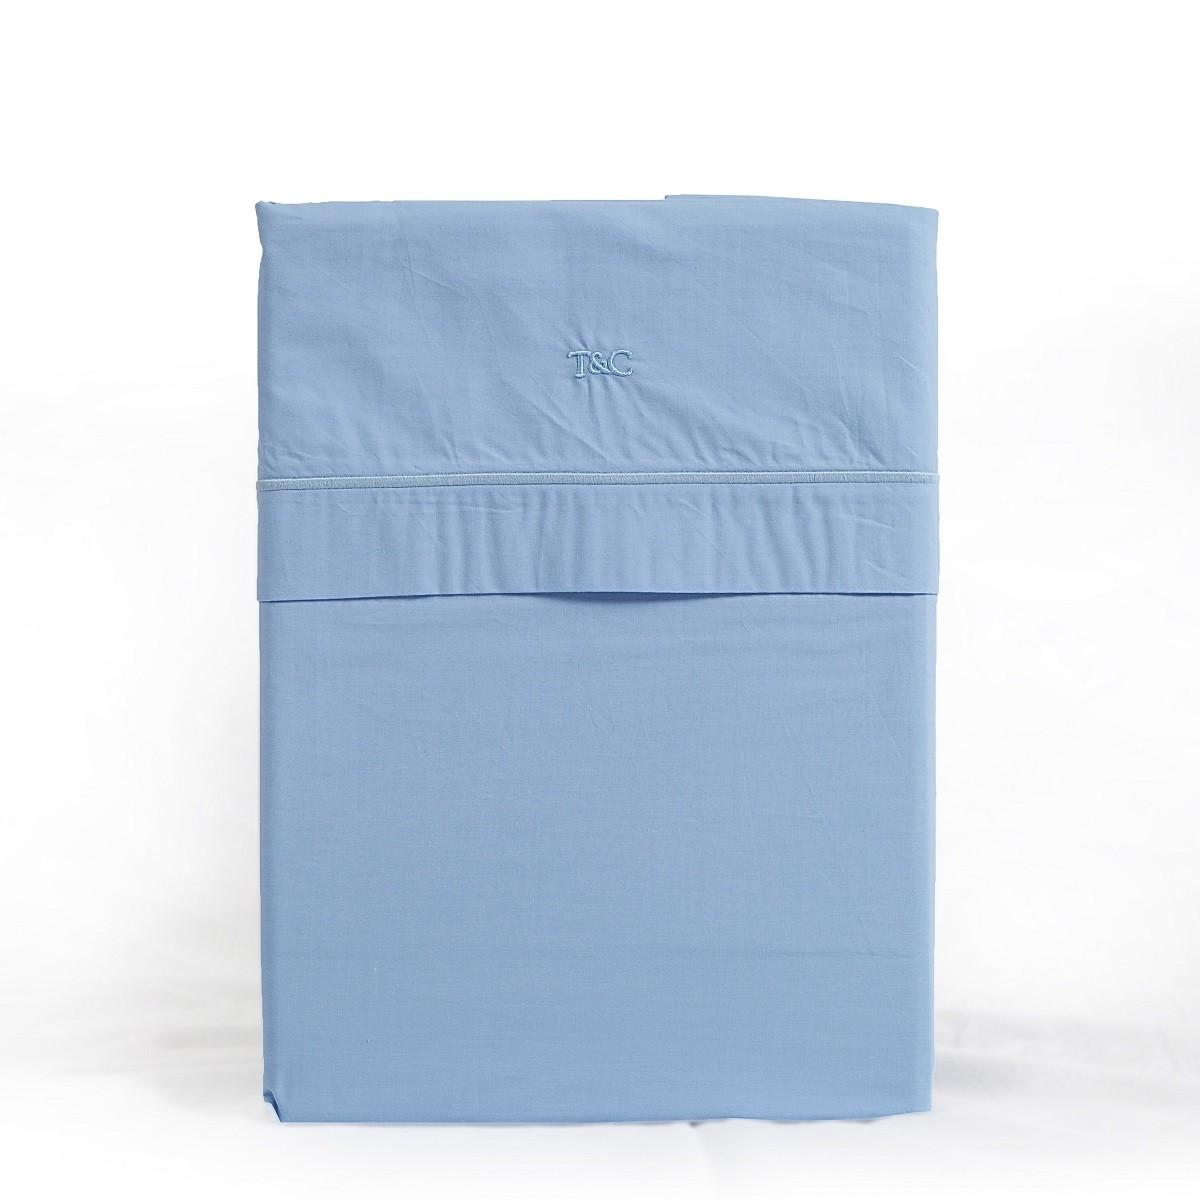 Laken cordon vrijstaand blue